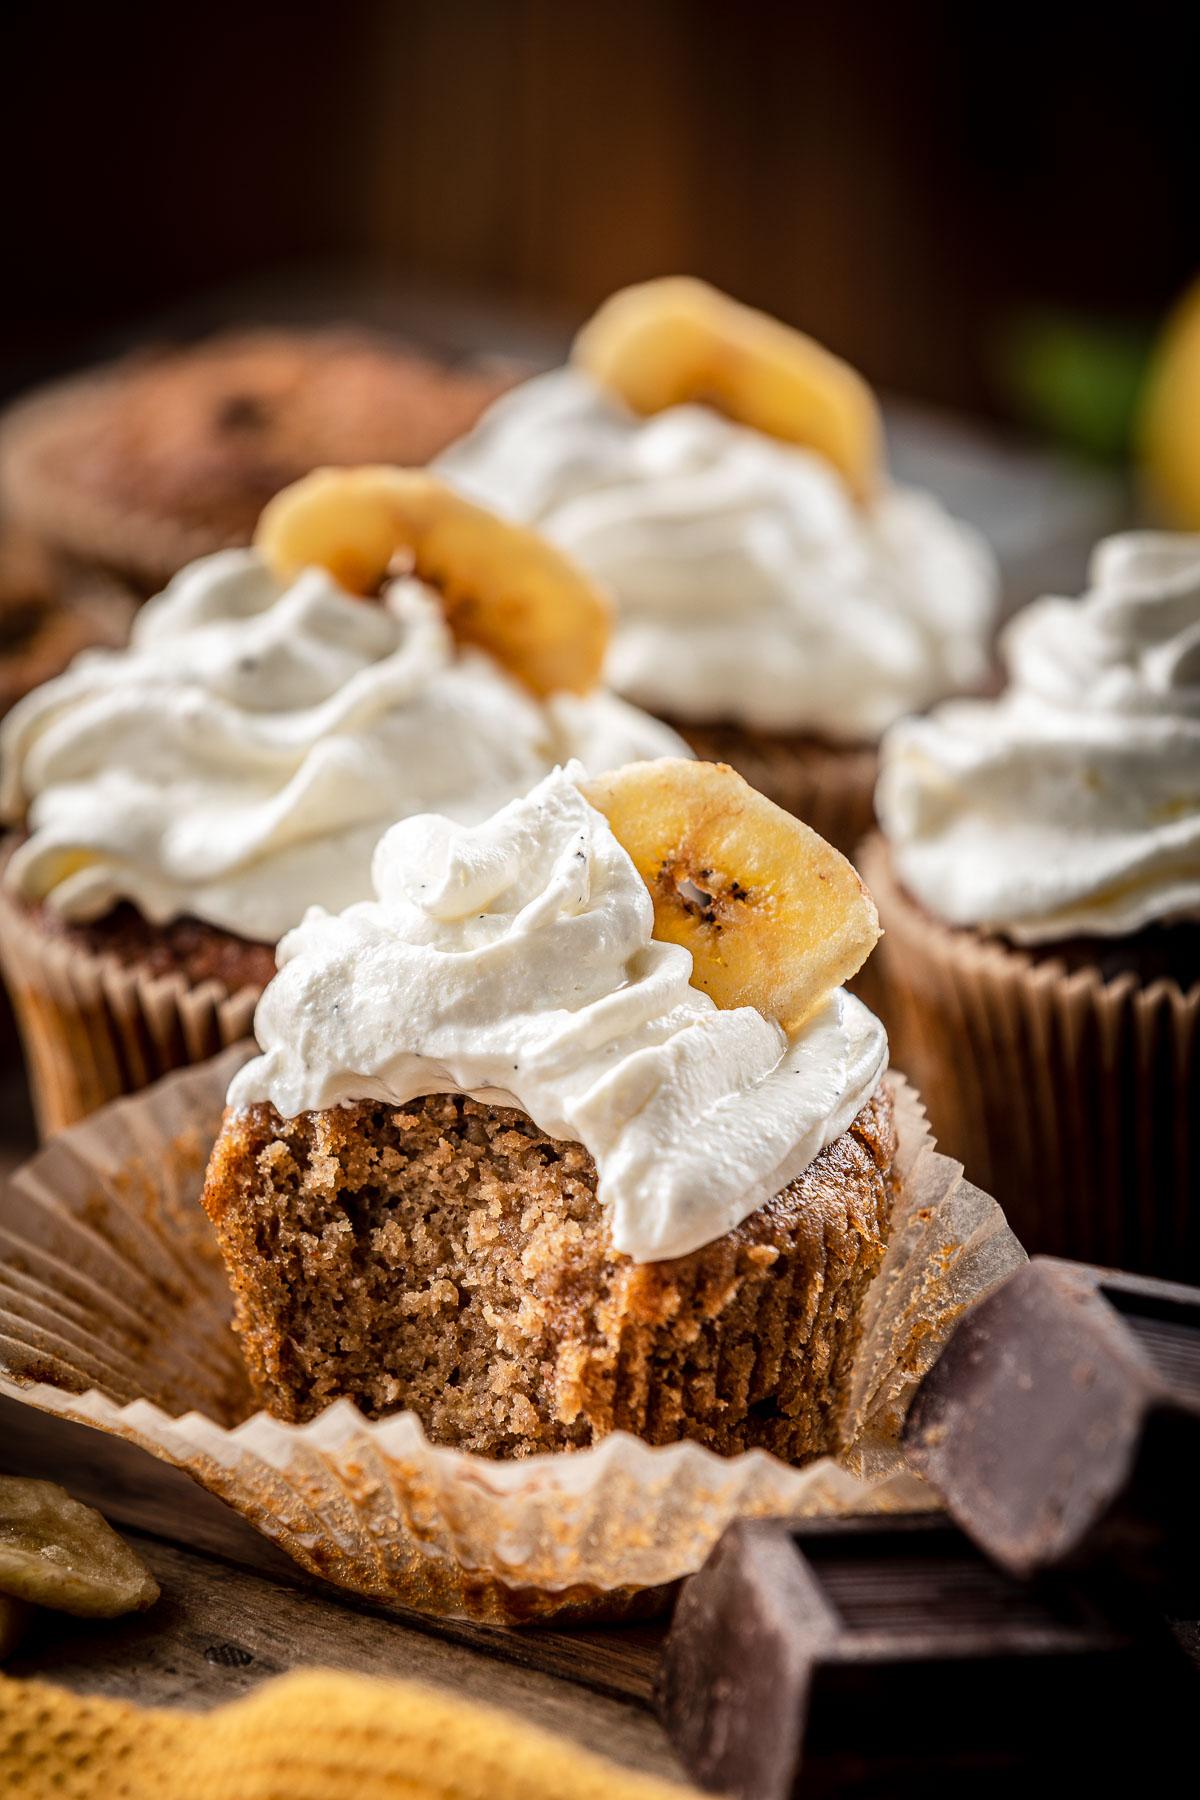 chocolate chip gluten-free VEGAN BANANA CUPCAKES recipe ricetta CUPCAKES VEGAN alla BANANA senza glutine con cioccolato